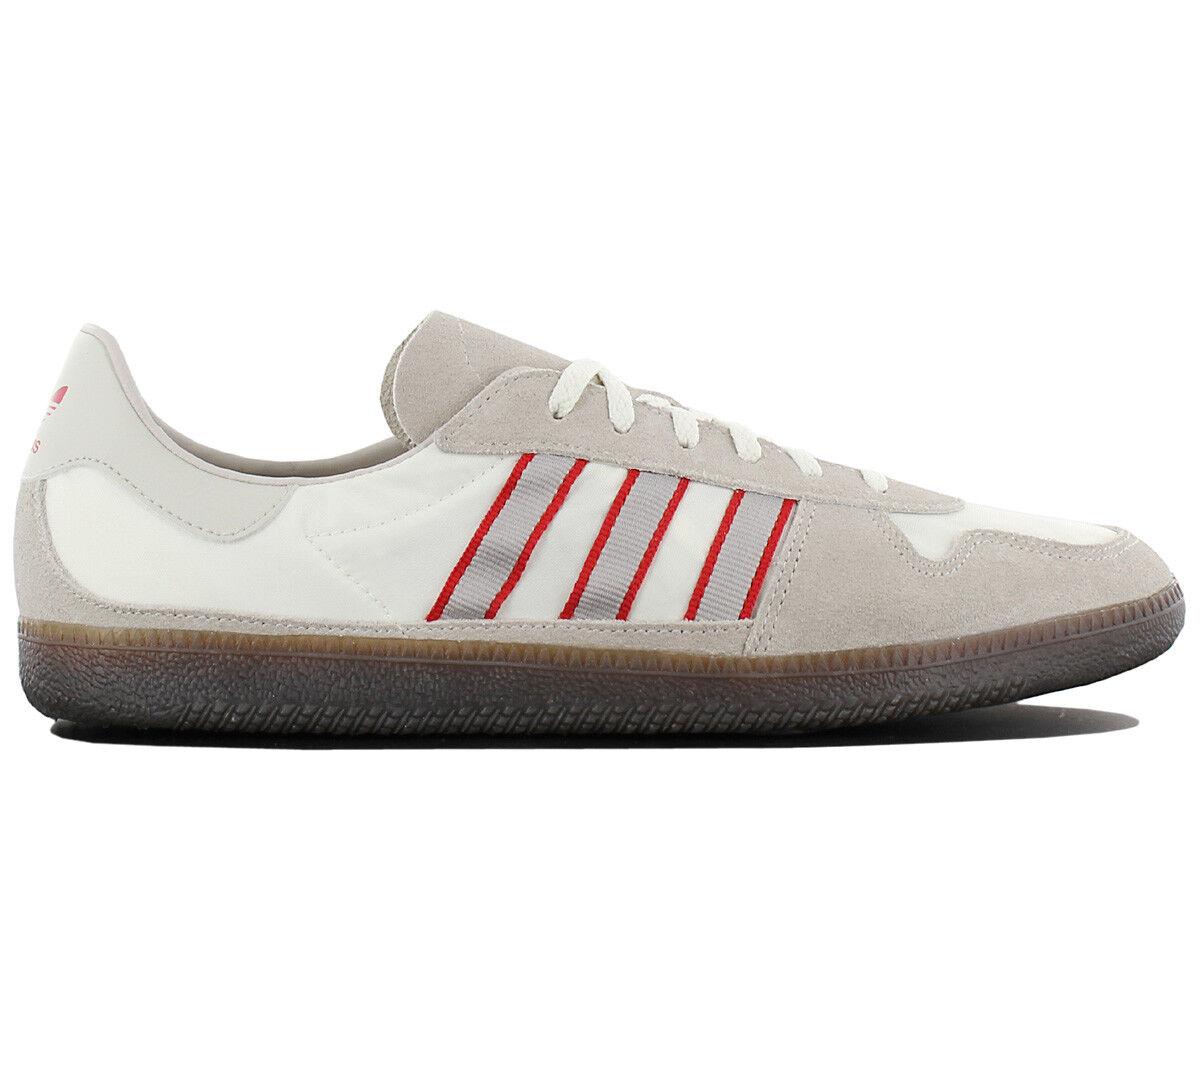 Adidas Originals Hulton Spécial Spzl Homme Retro Basket Chaussure baskets